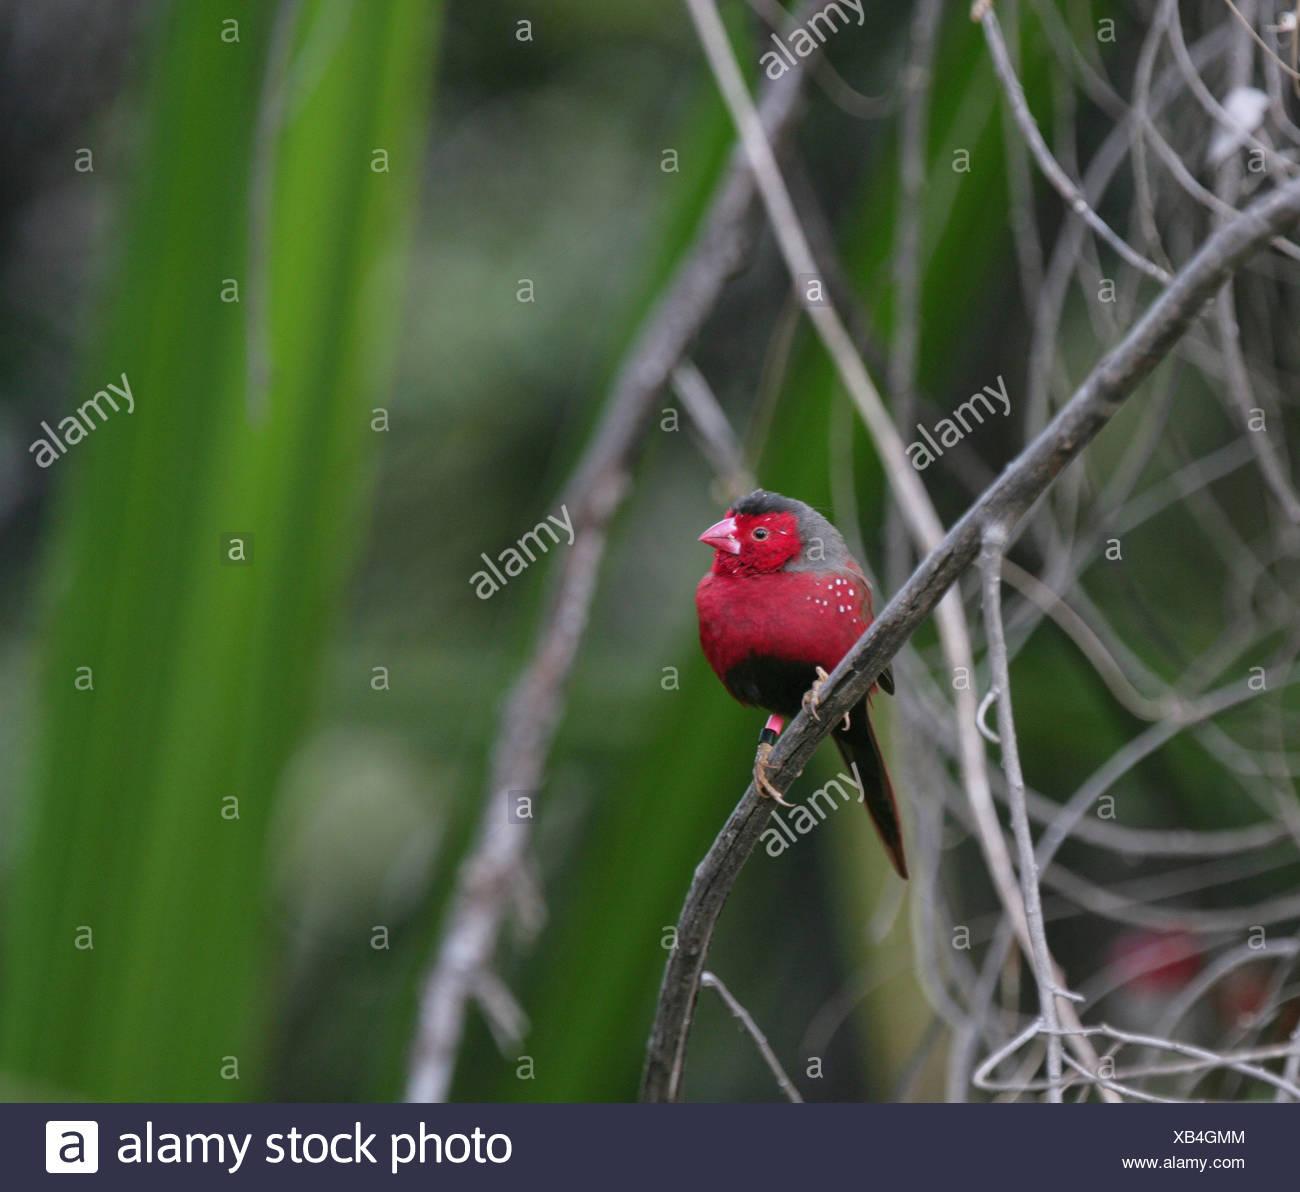 Crimson finch, Kimberley region, Western Australia - Stock Image